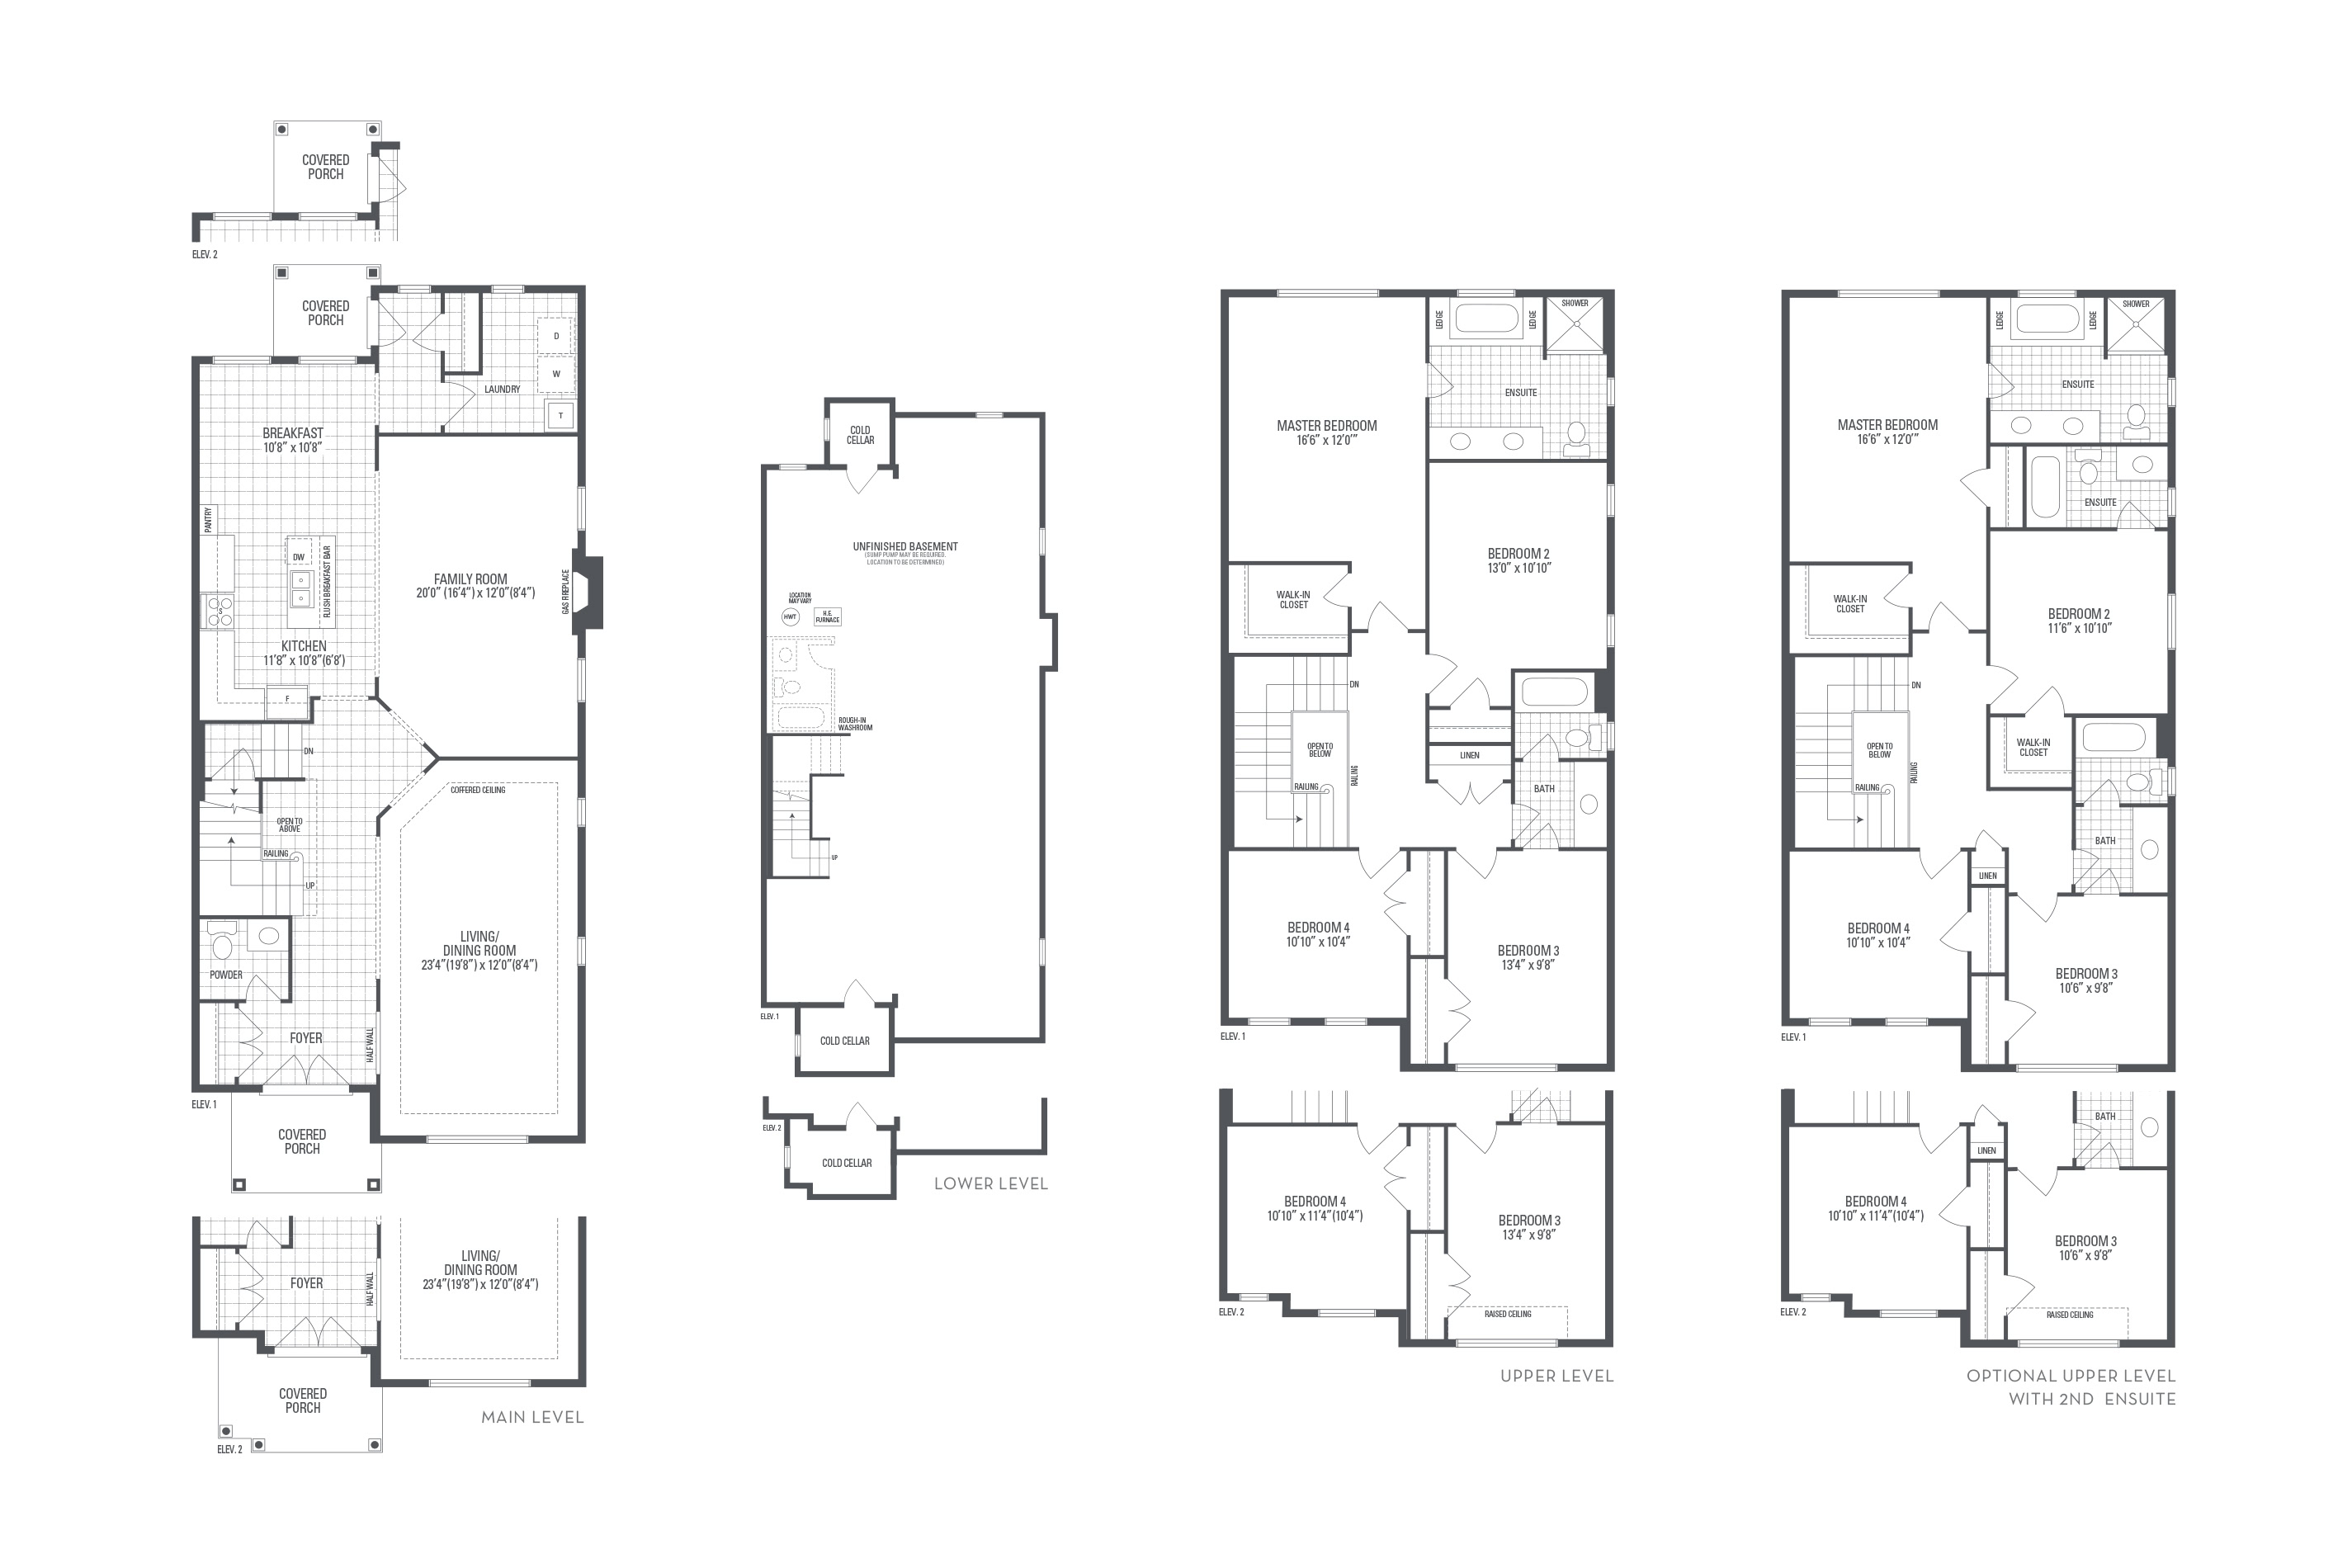 Savana 01 Elev. 2 Floorplan Thumbnail